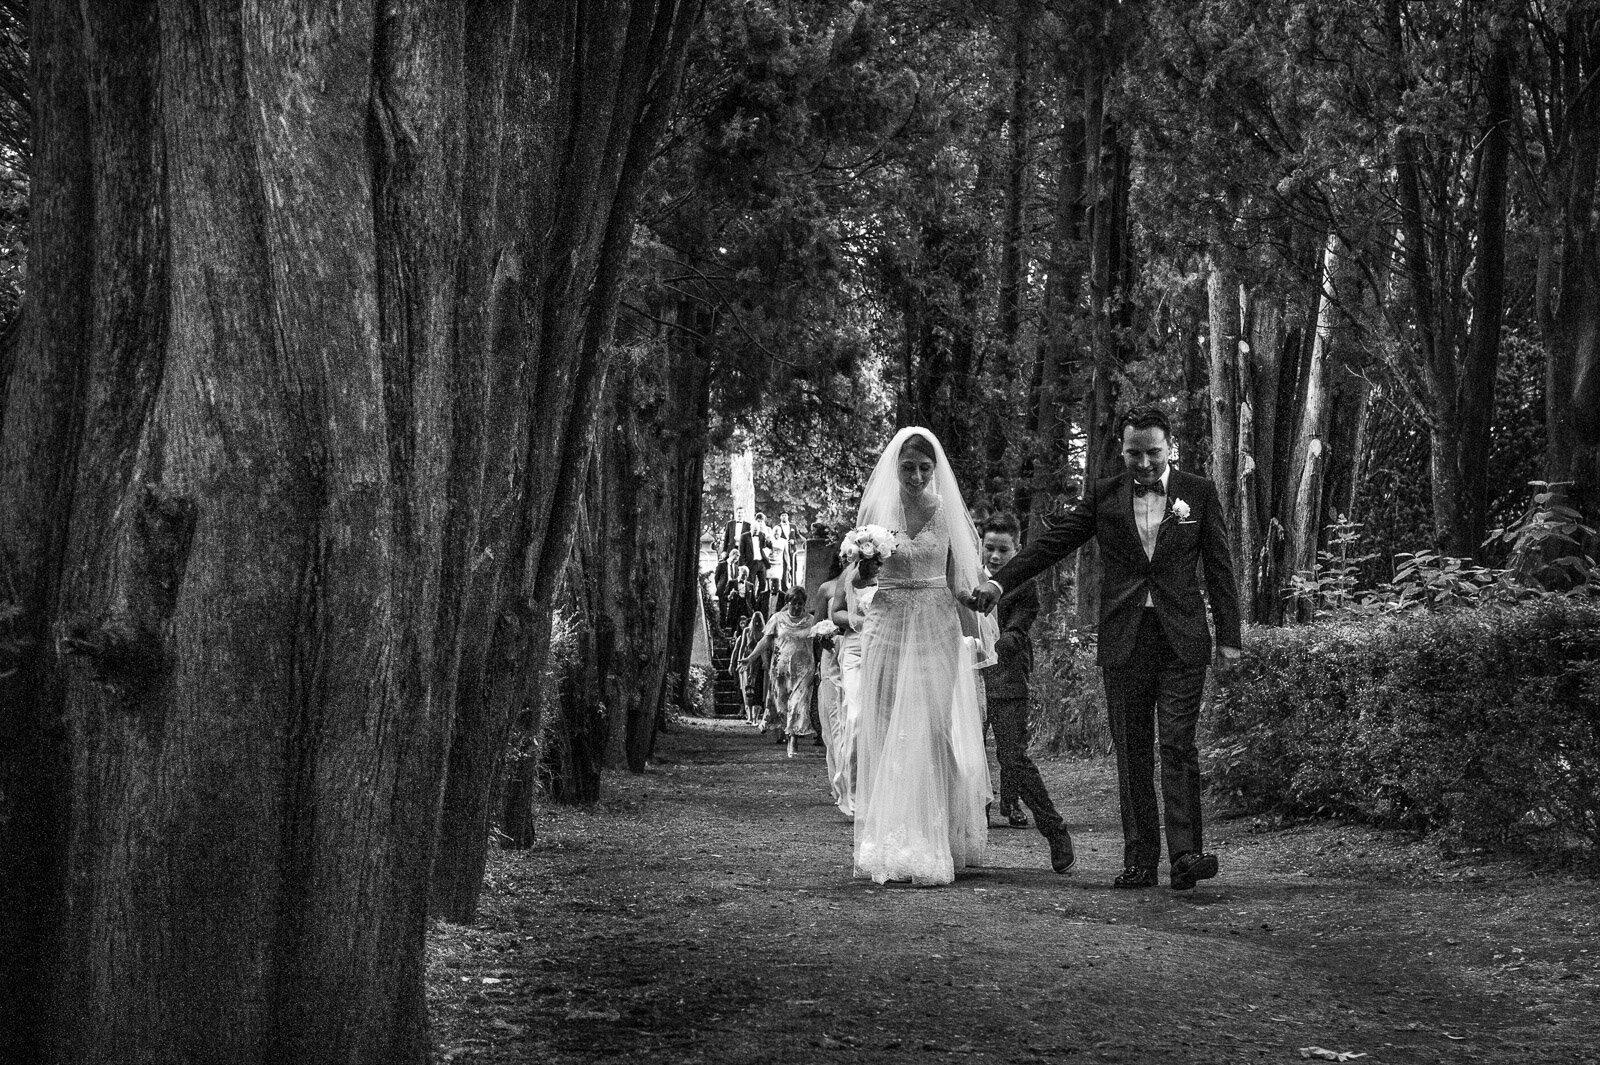 Russian Wedding in Villa Cimbrone Costiera Amalfitana 15.jpg